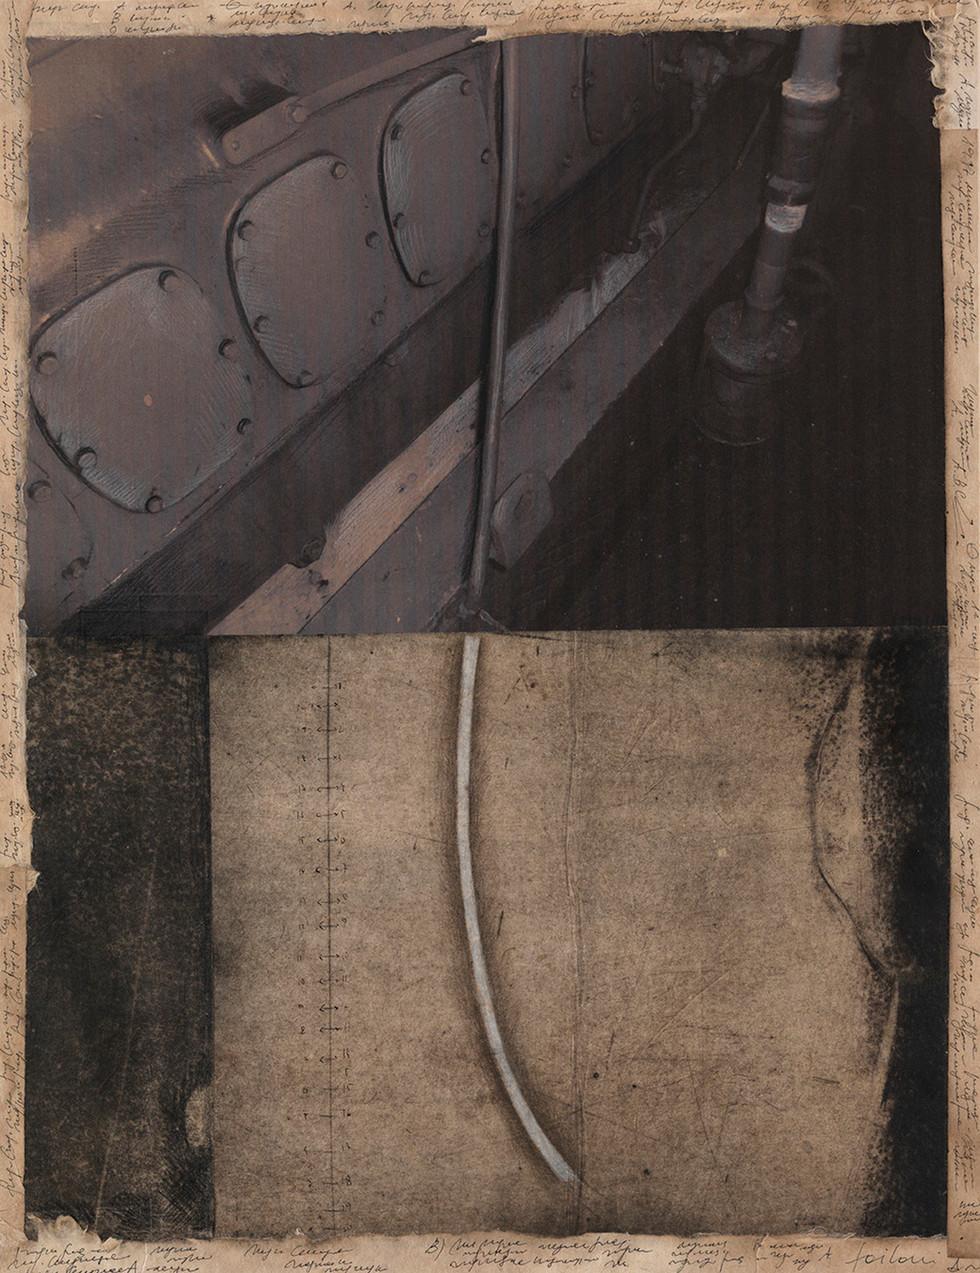 Ursus, 2009, tecnica mista su carta, cm 56 x 42